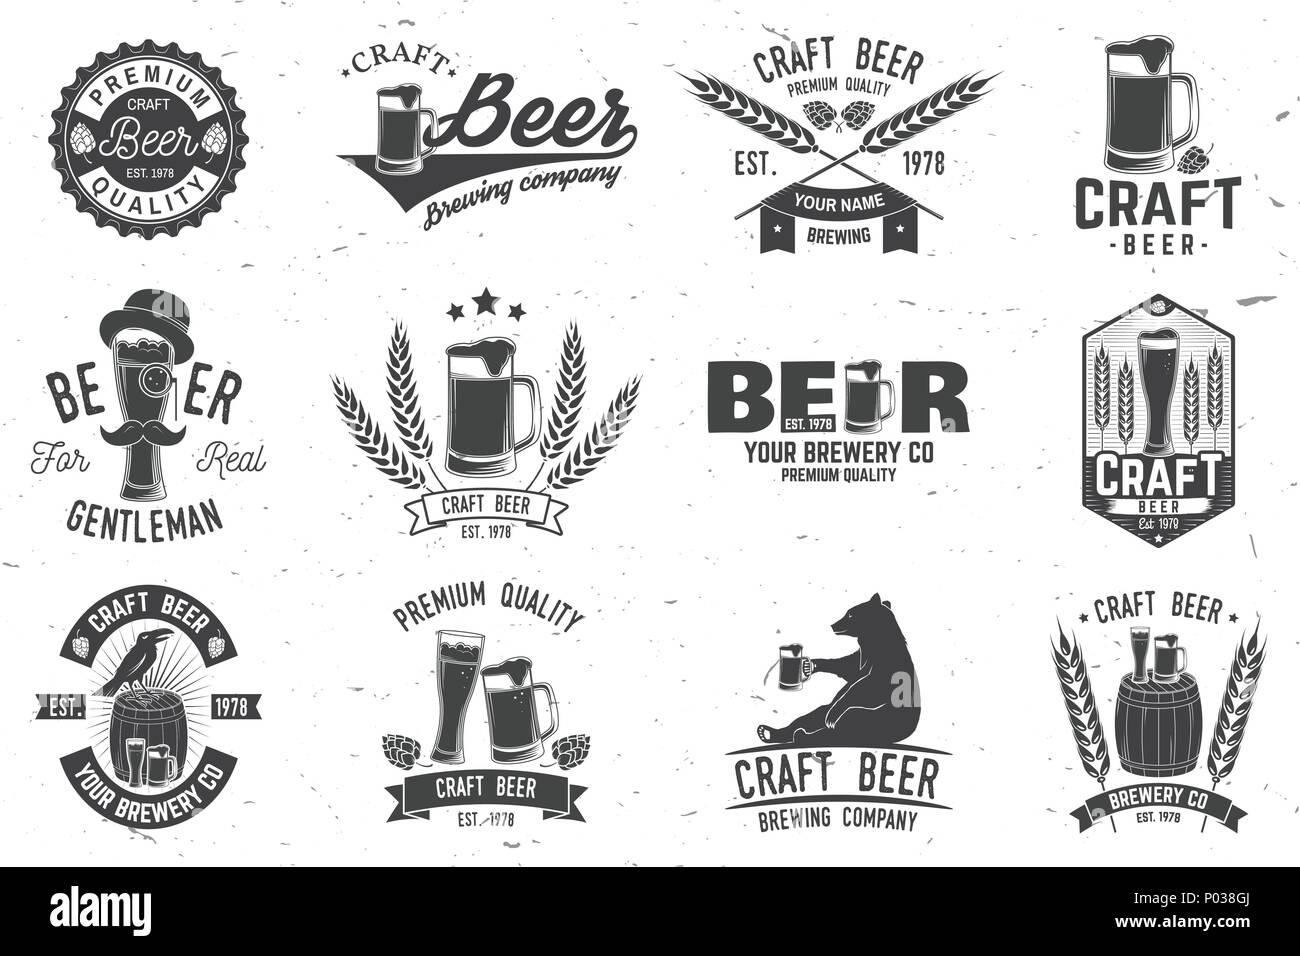 Set of Craft Beer badges with hops, raven and bear. Vector illustration. Vintage design for bar, pub and restaurant business. Coaster for beer. - Stock Vector